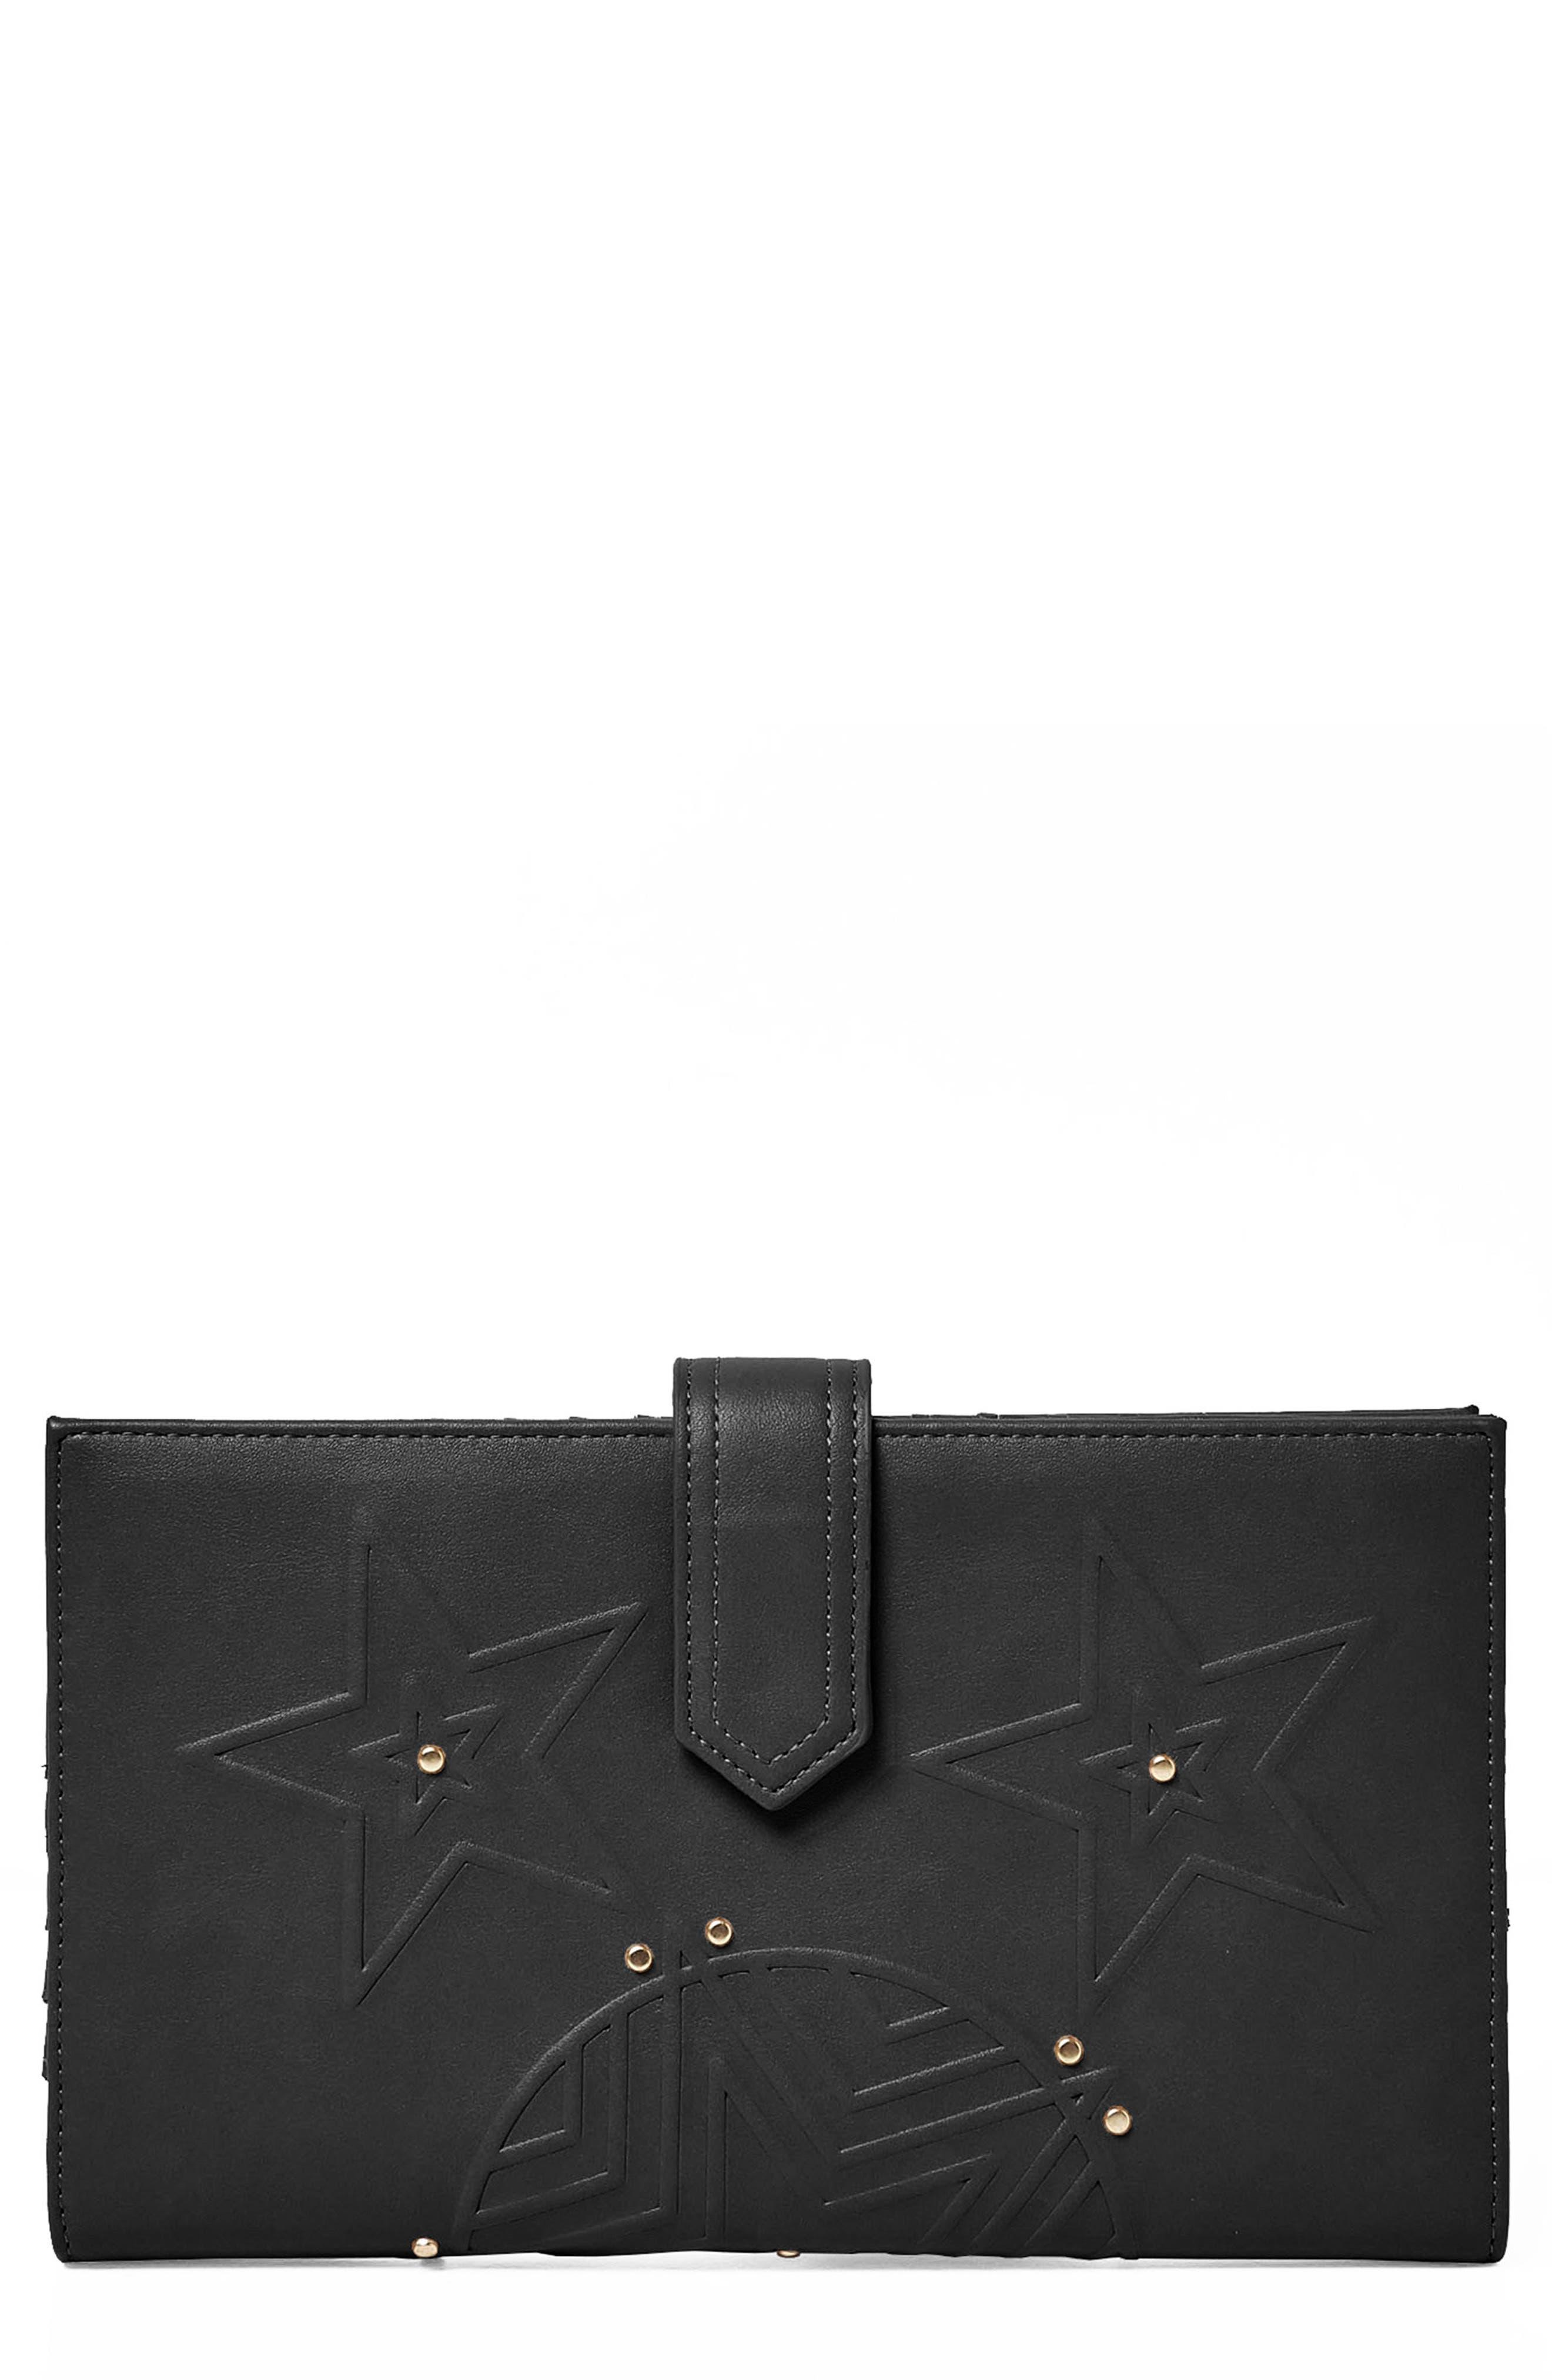 Starstruck Vegan Leather Wallet,                         Main,                         color,